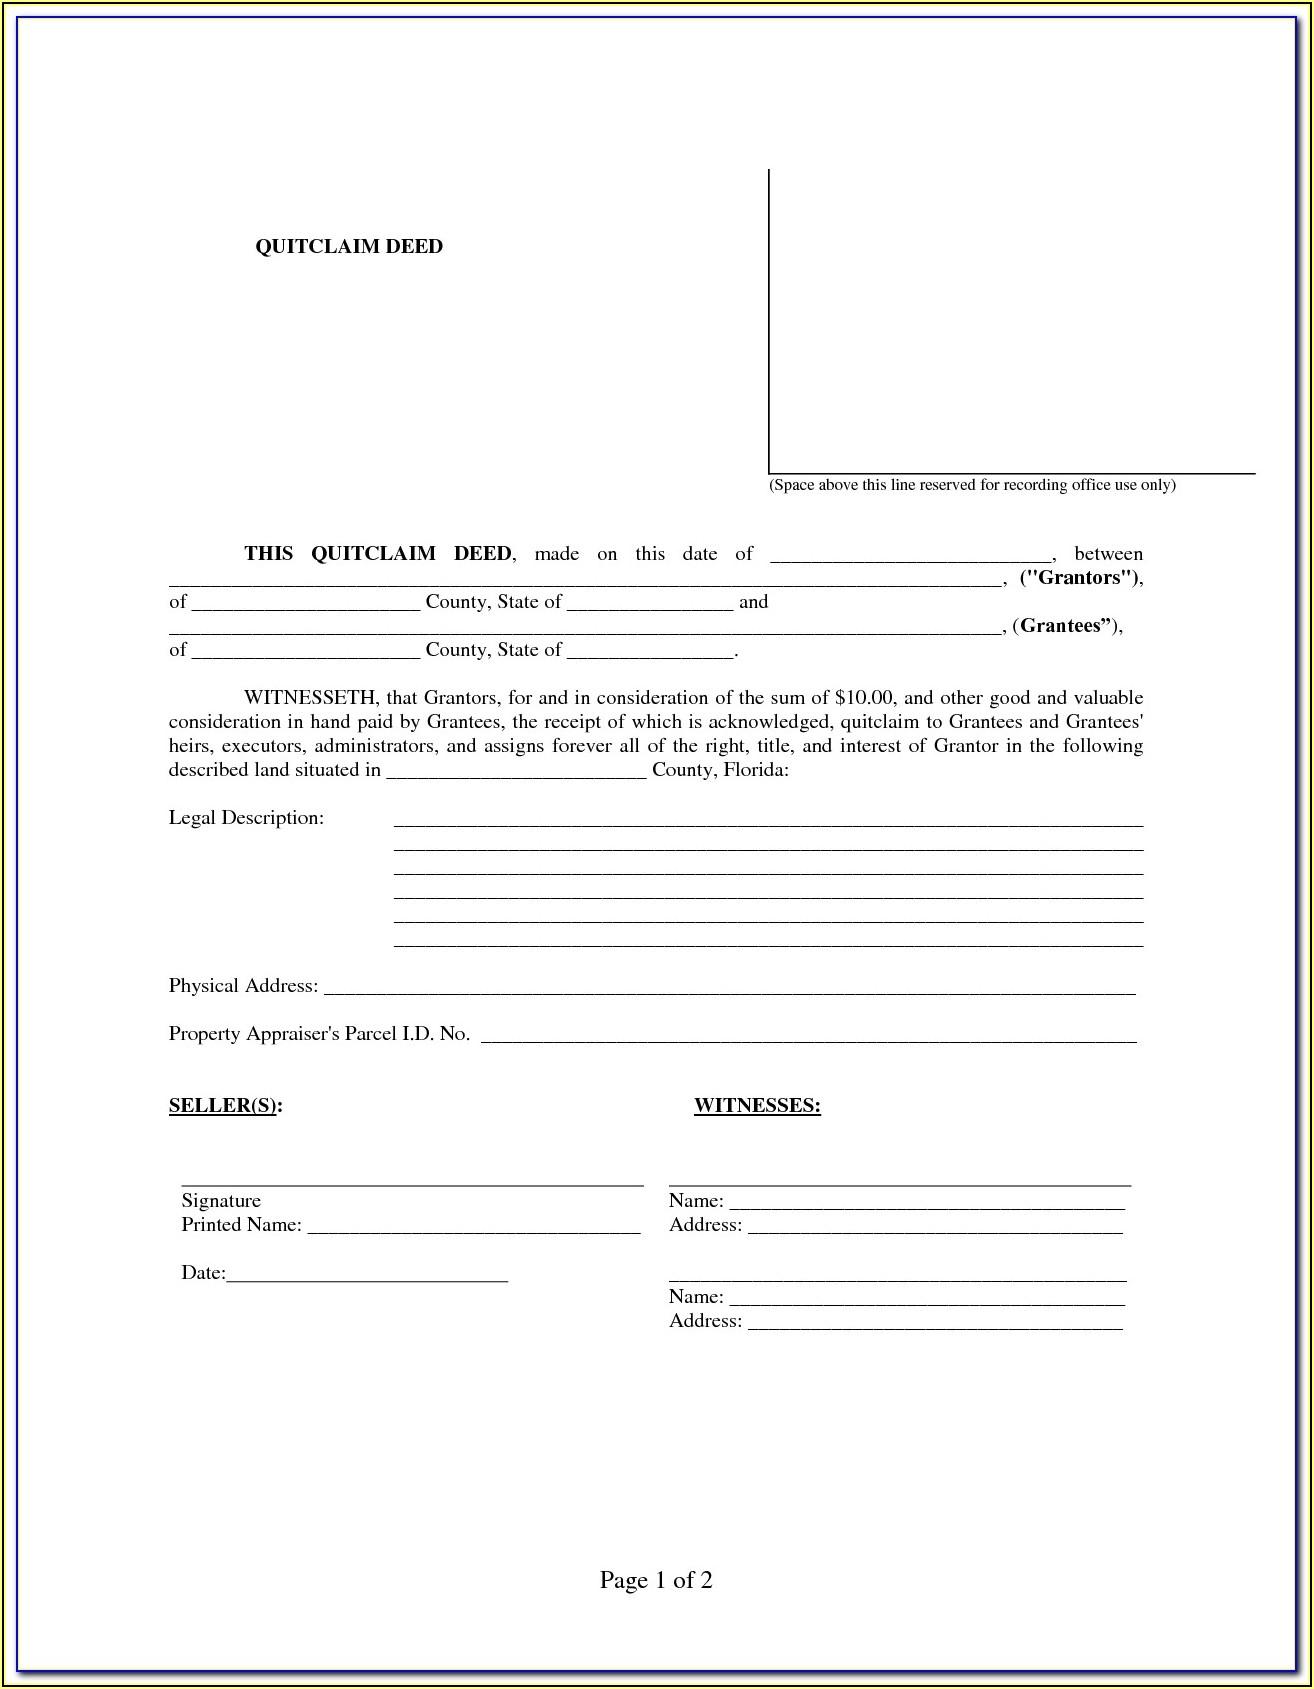 Printable Quit Claim Deed Form Florida